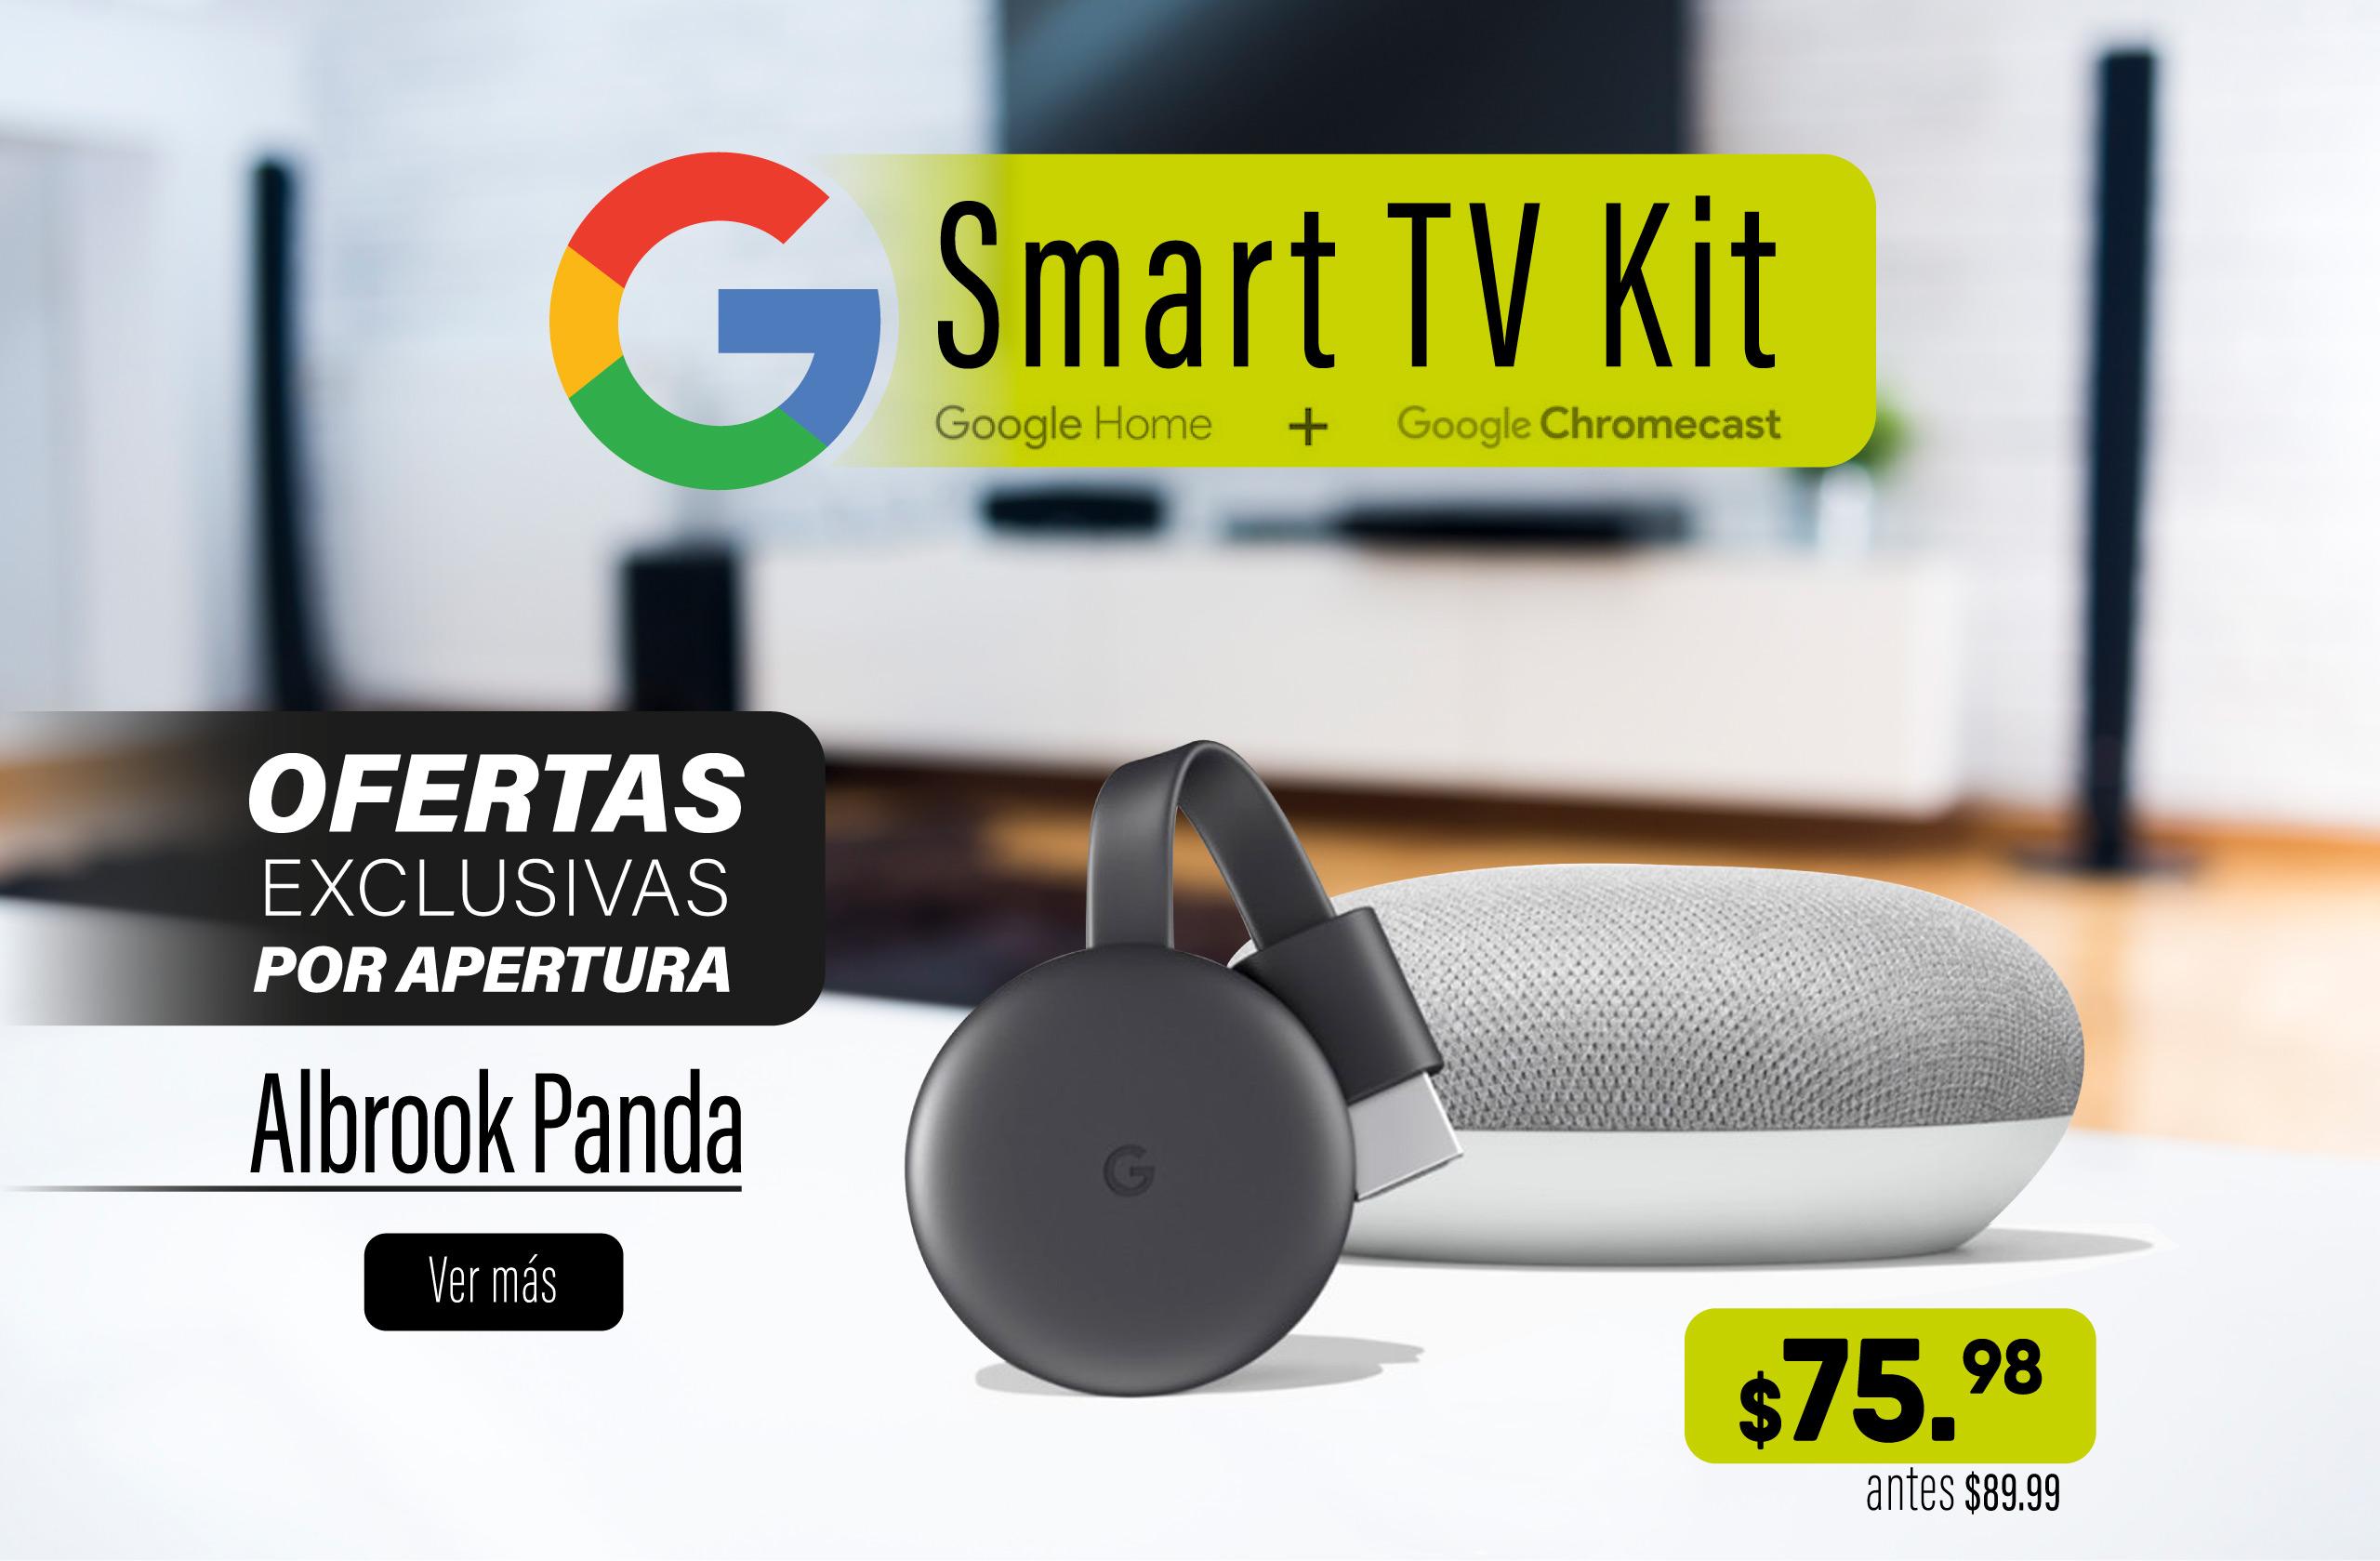 Región2-oferta apertura albrook-pandasmart-tv-kit-$75.98